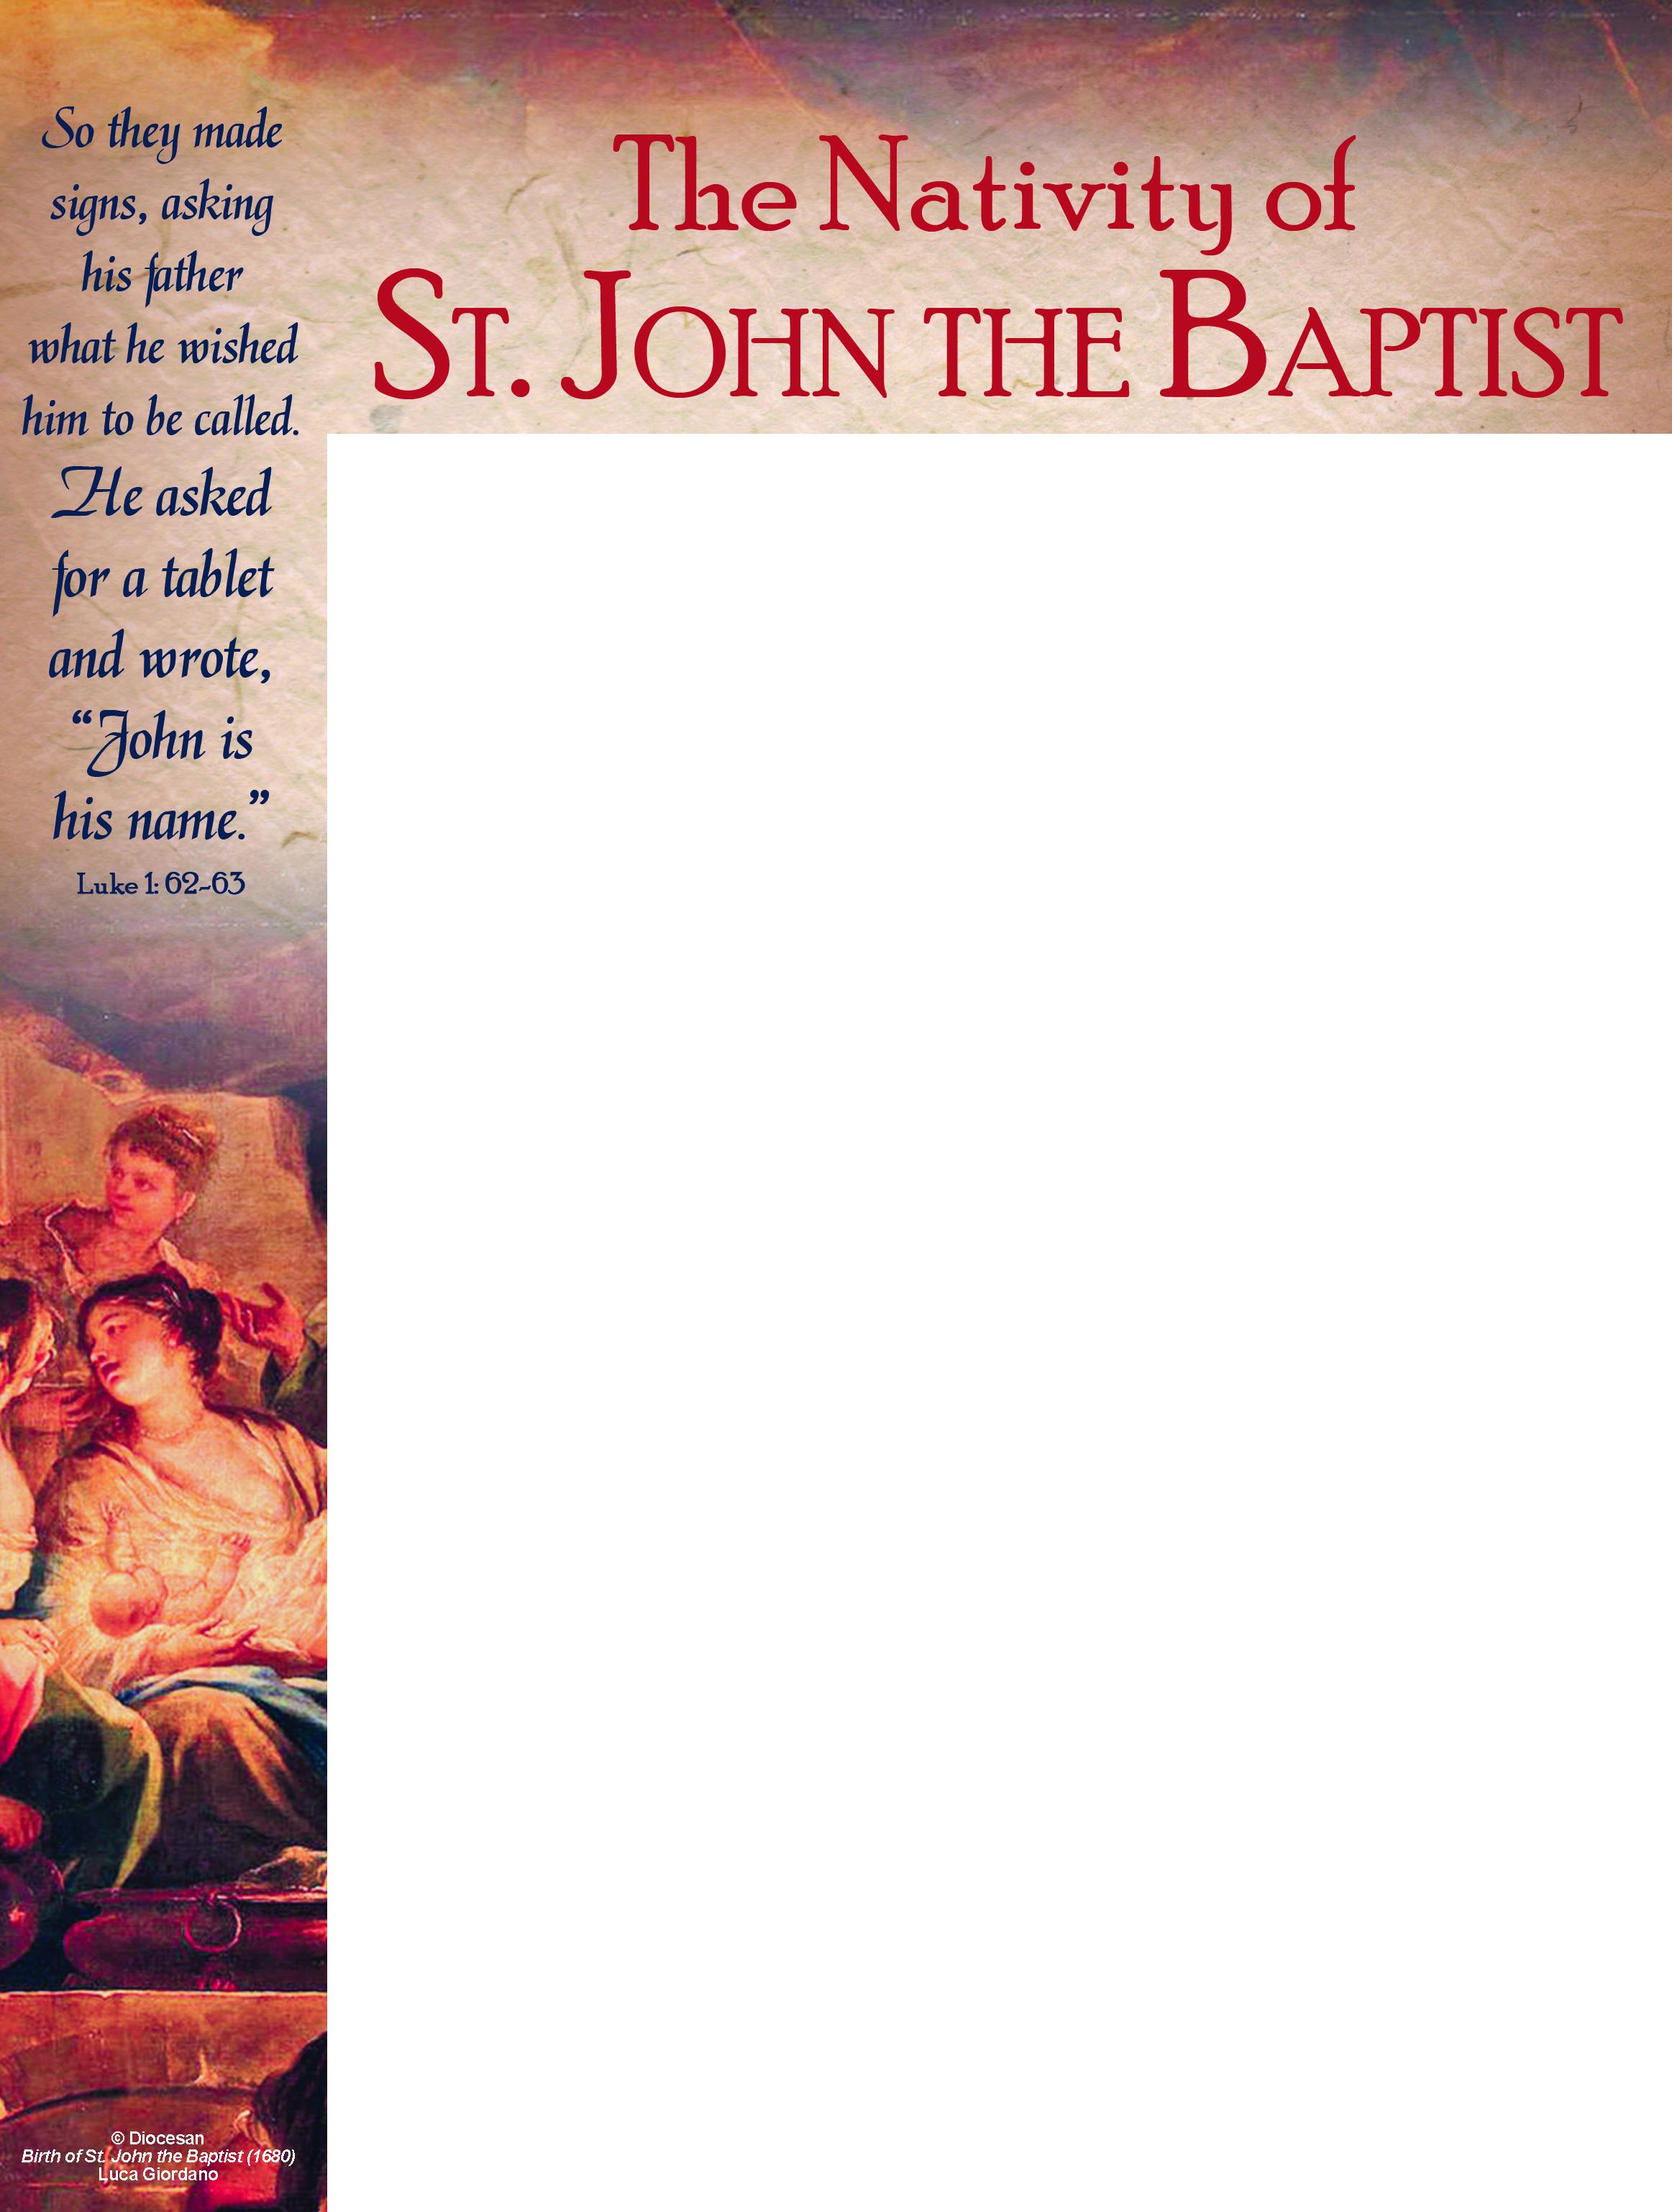 John the Baptist 2018 Traditional Wrapper